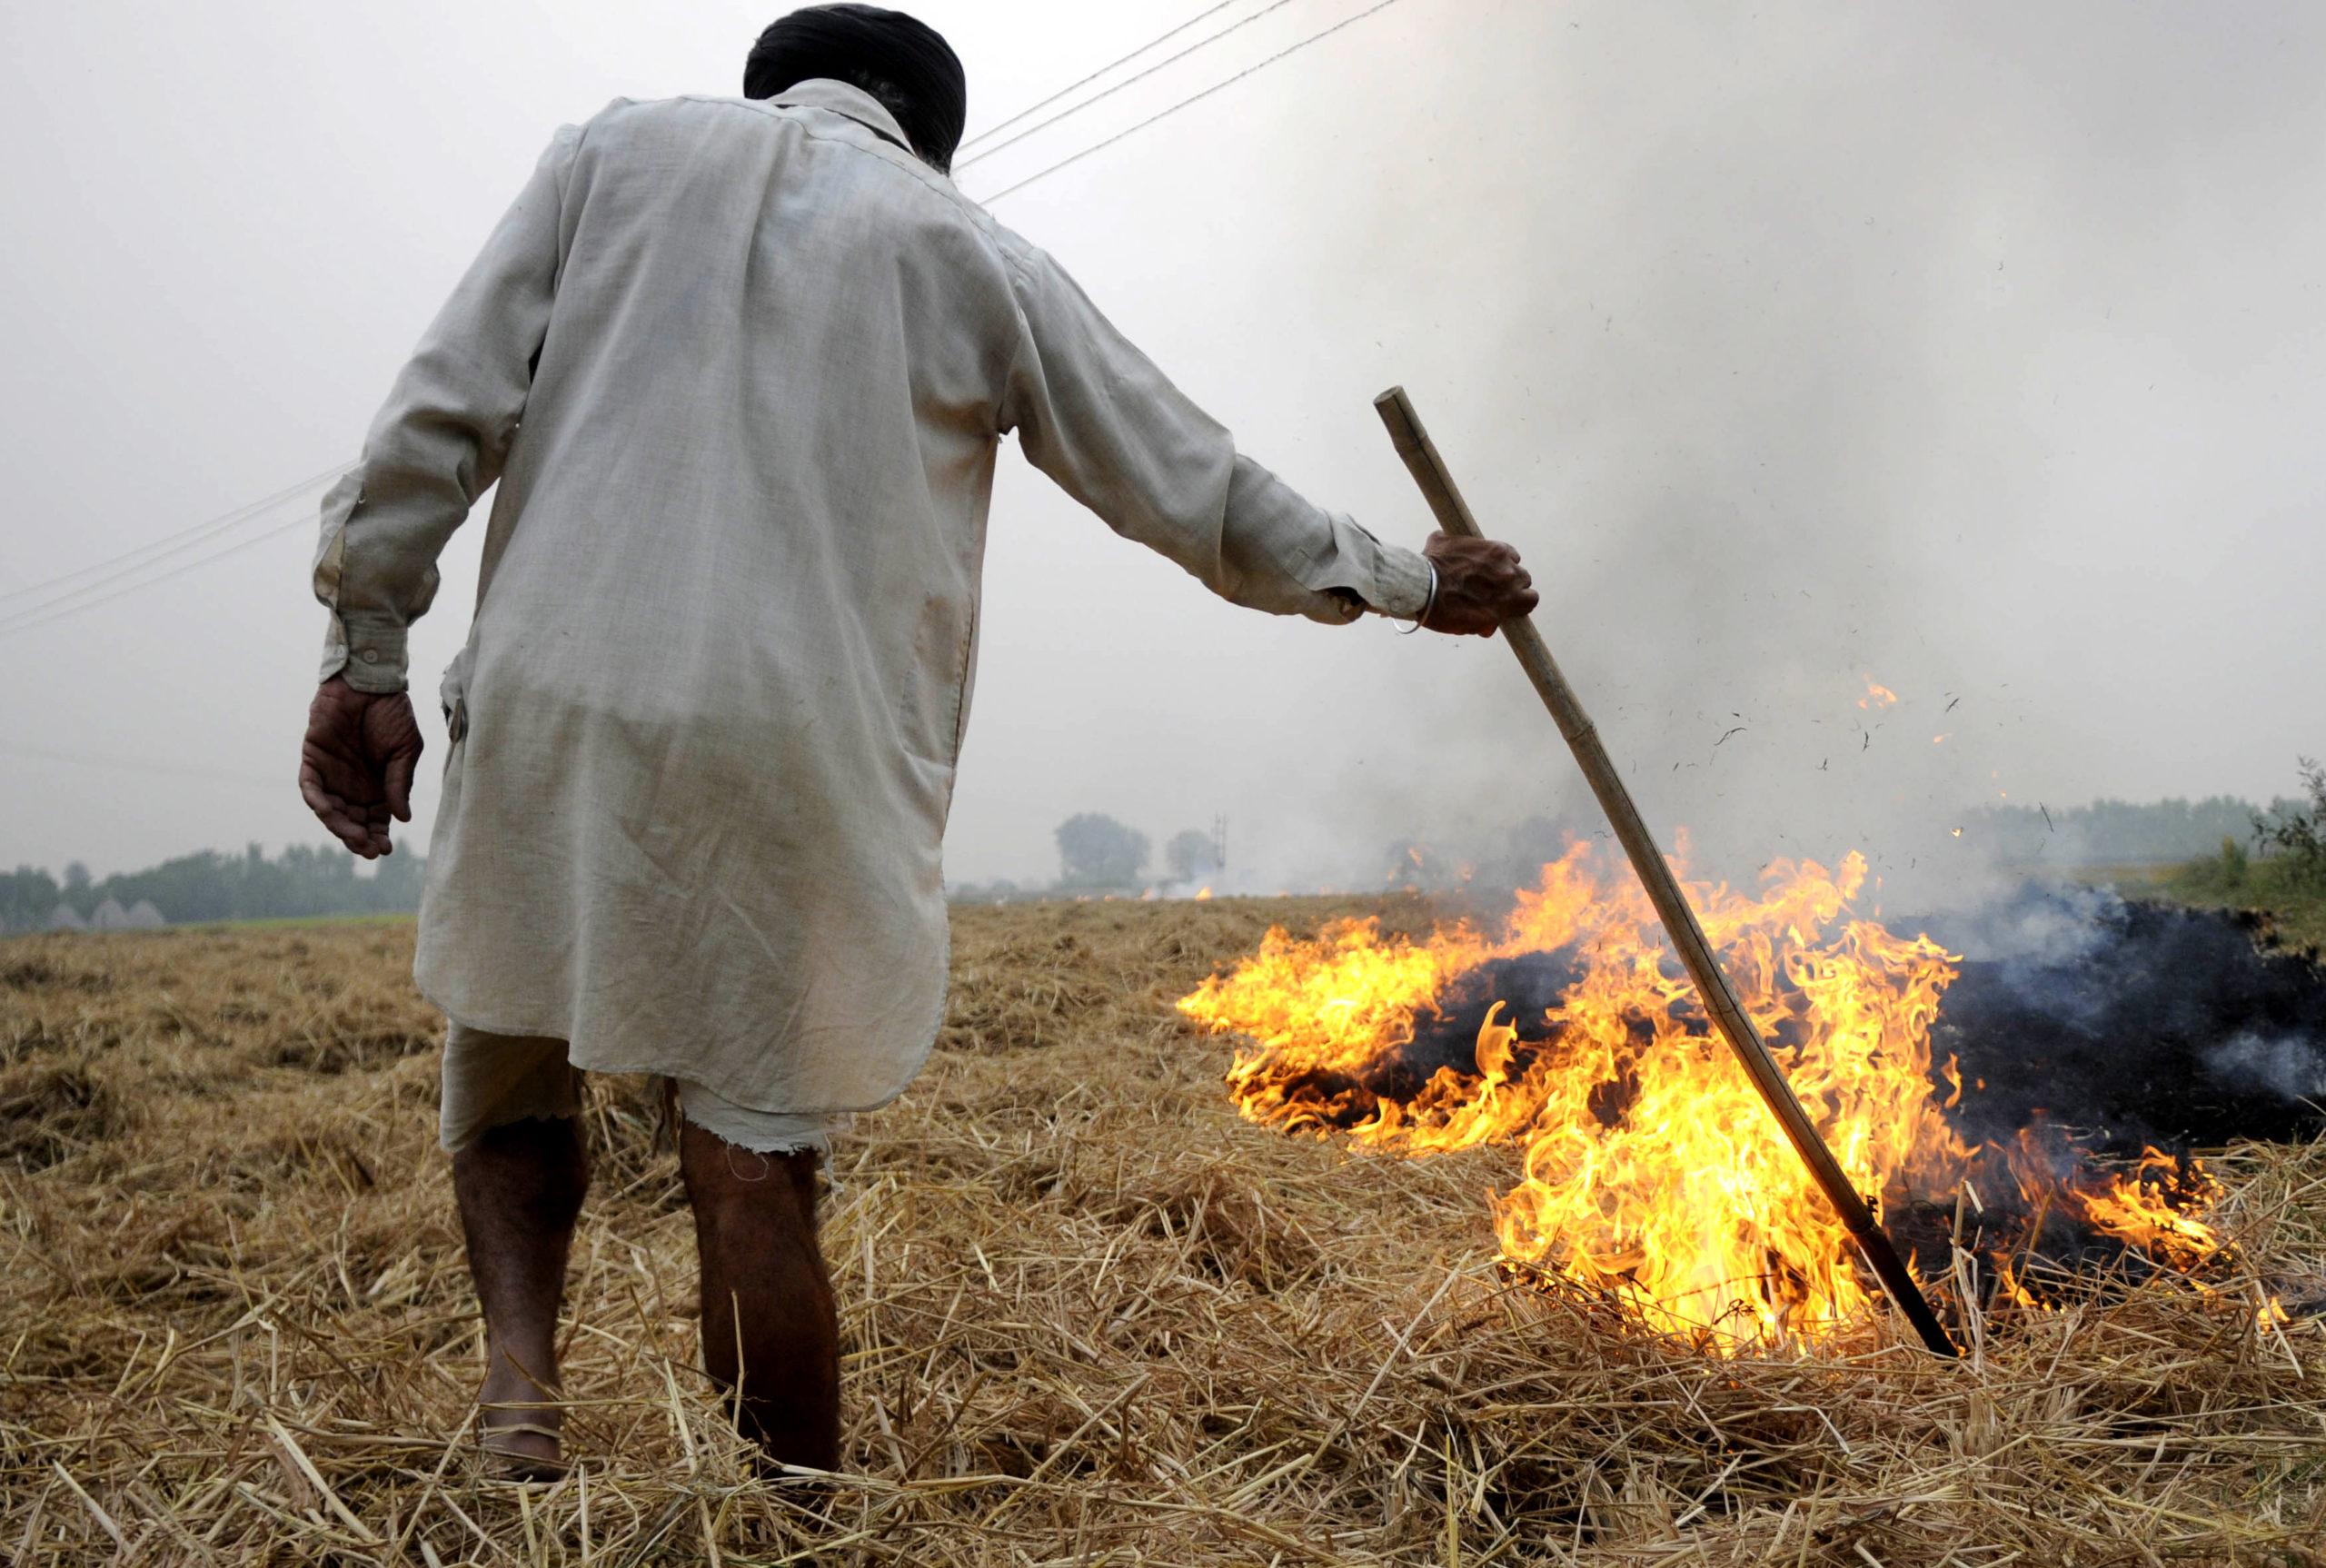 Farmer Burning Paddy Stubble at Sanour village near Patiala. Photo by special arrangement.